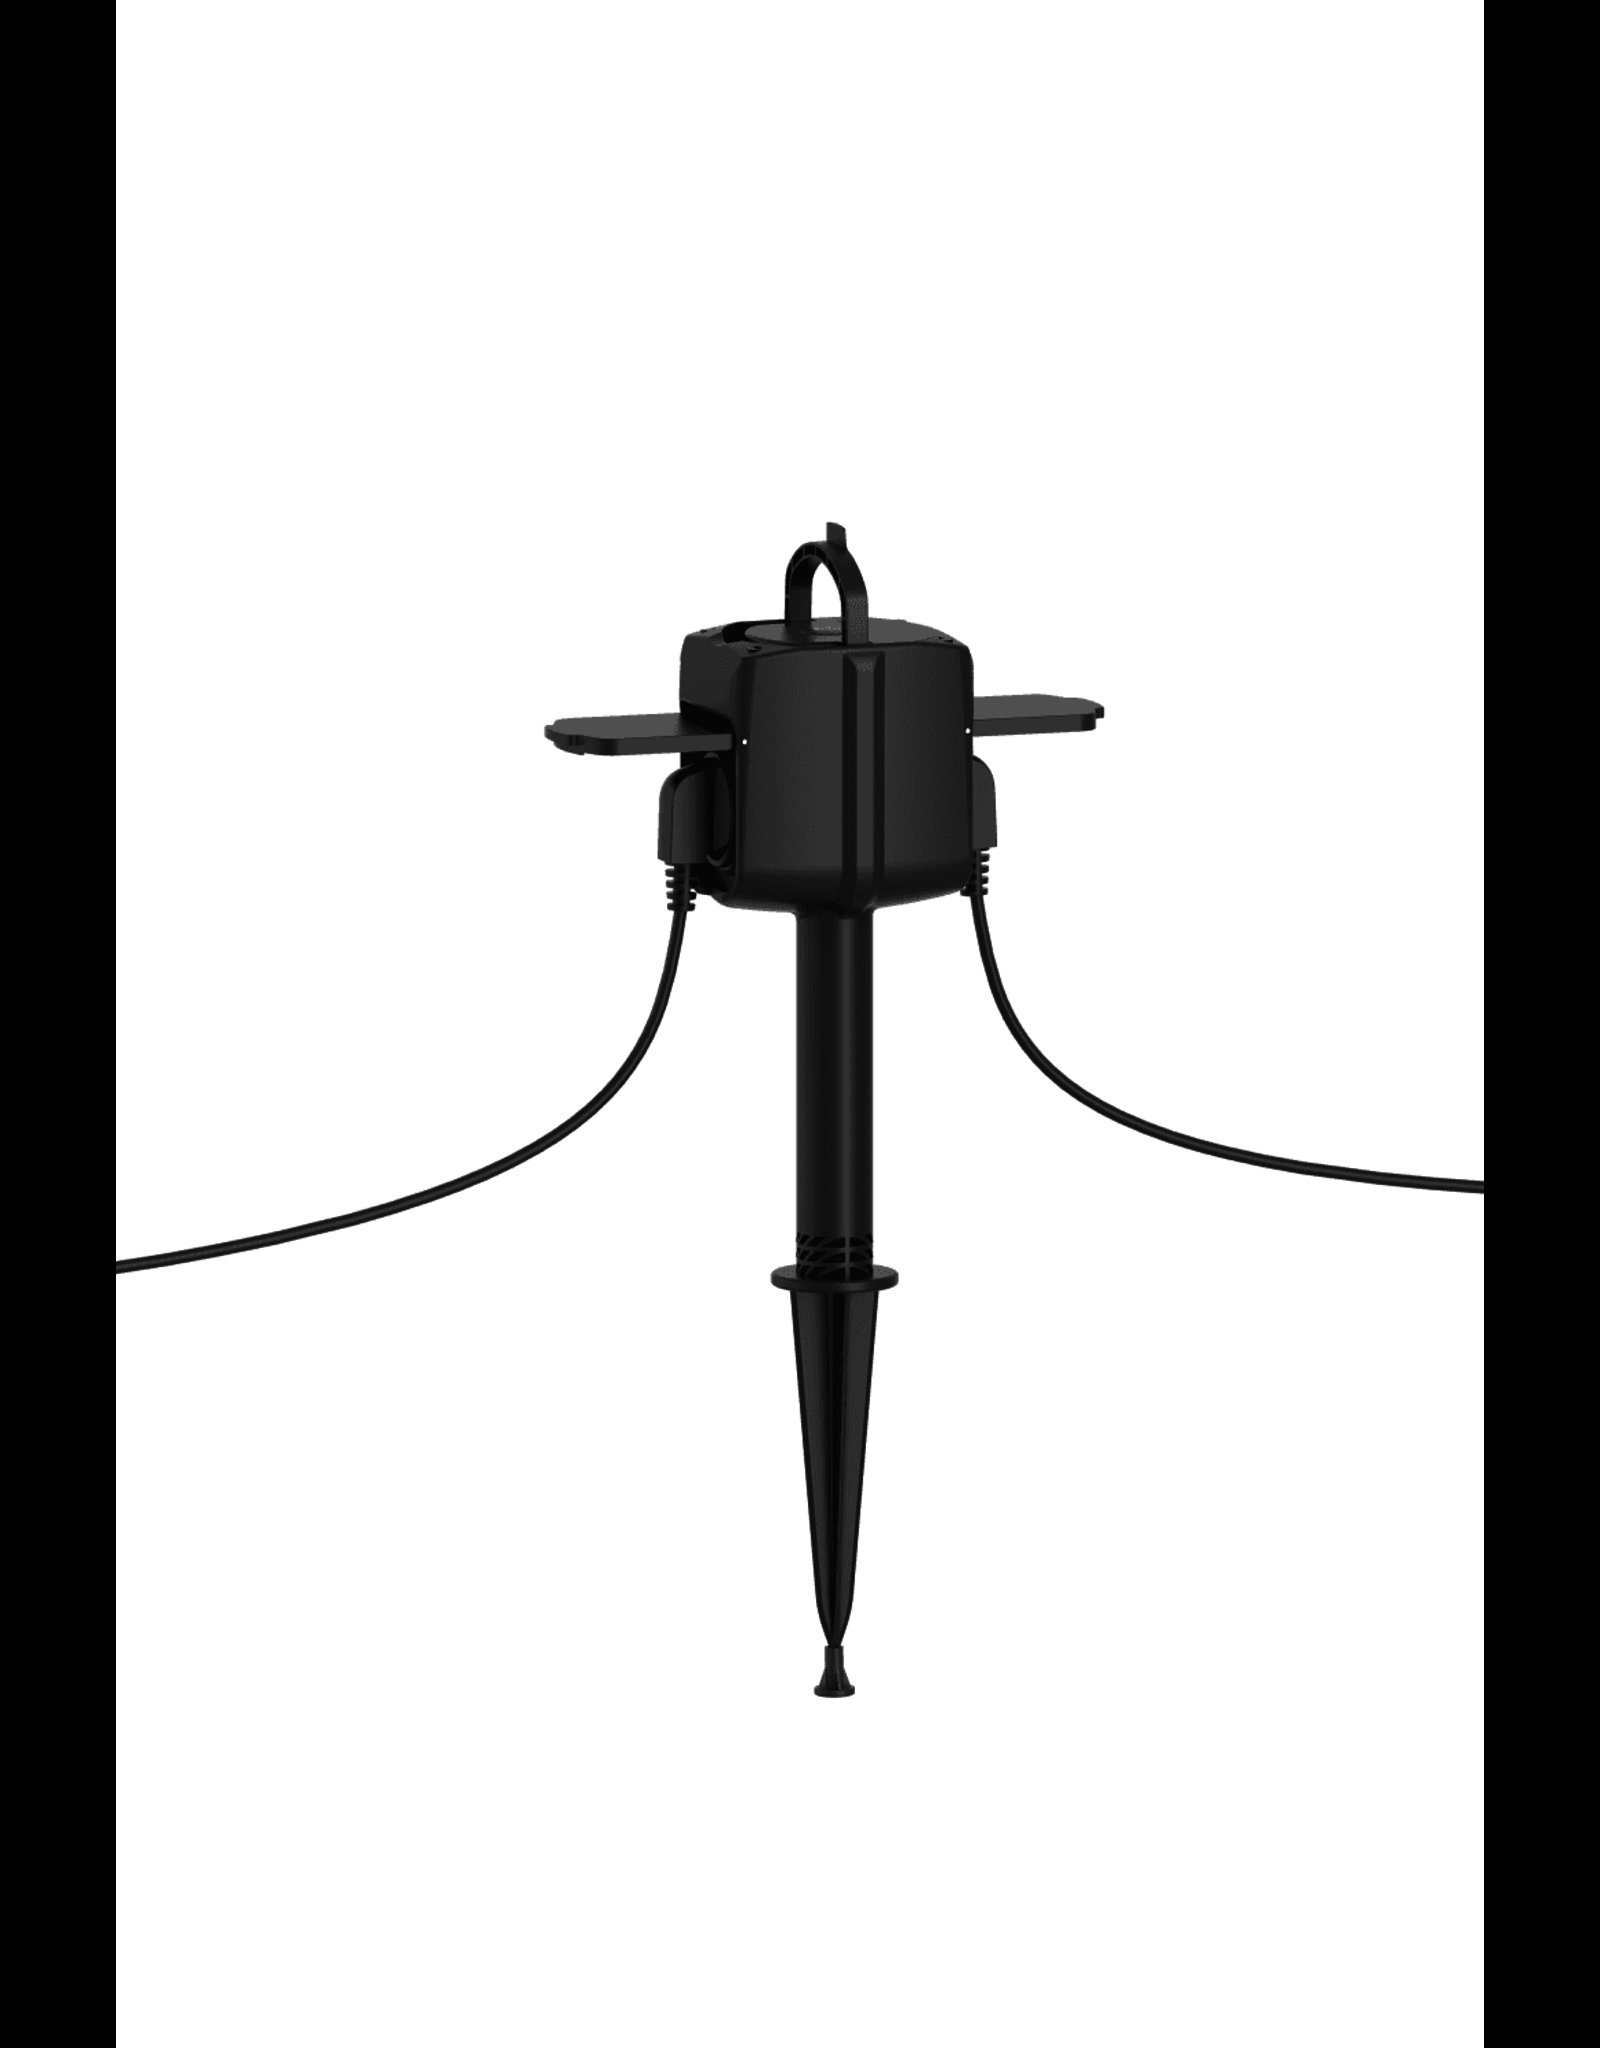 Woox Home Woox Smart Wifi Outdoor Two-way Socket | R6079